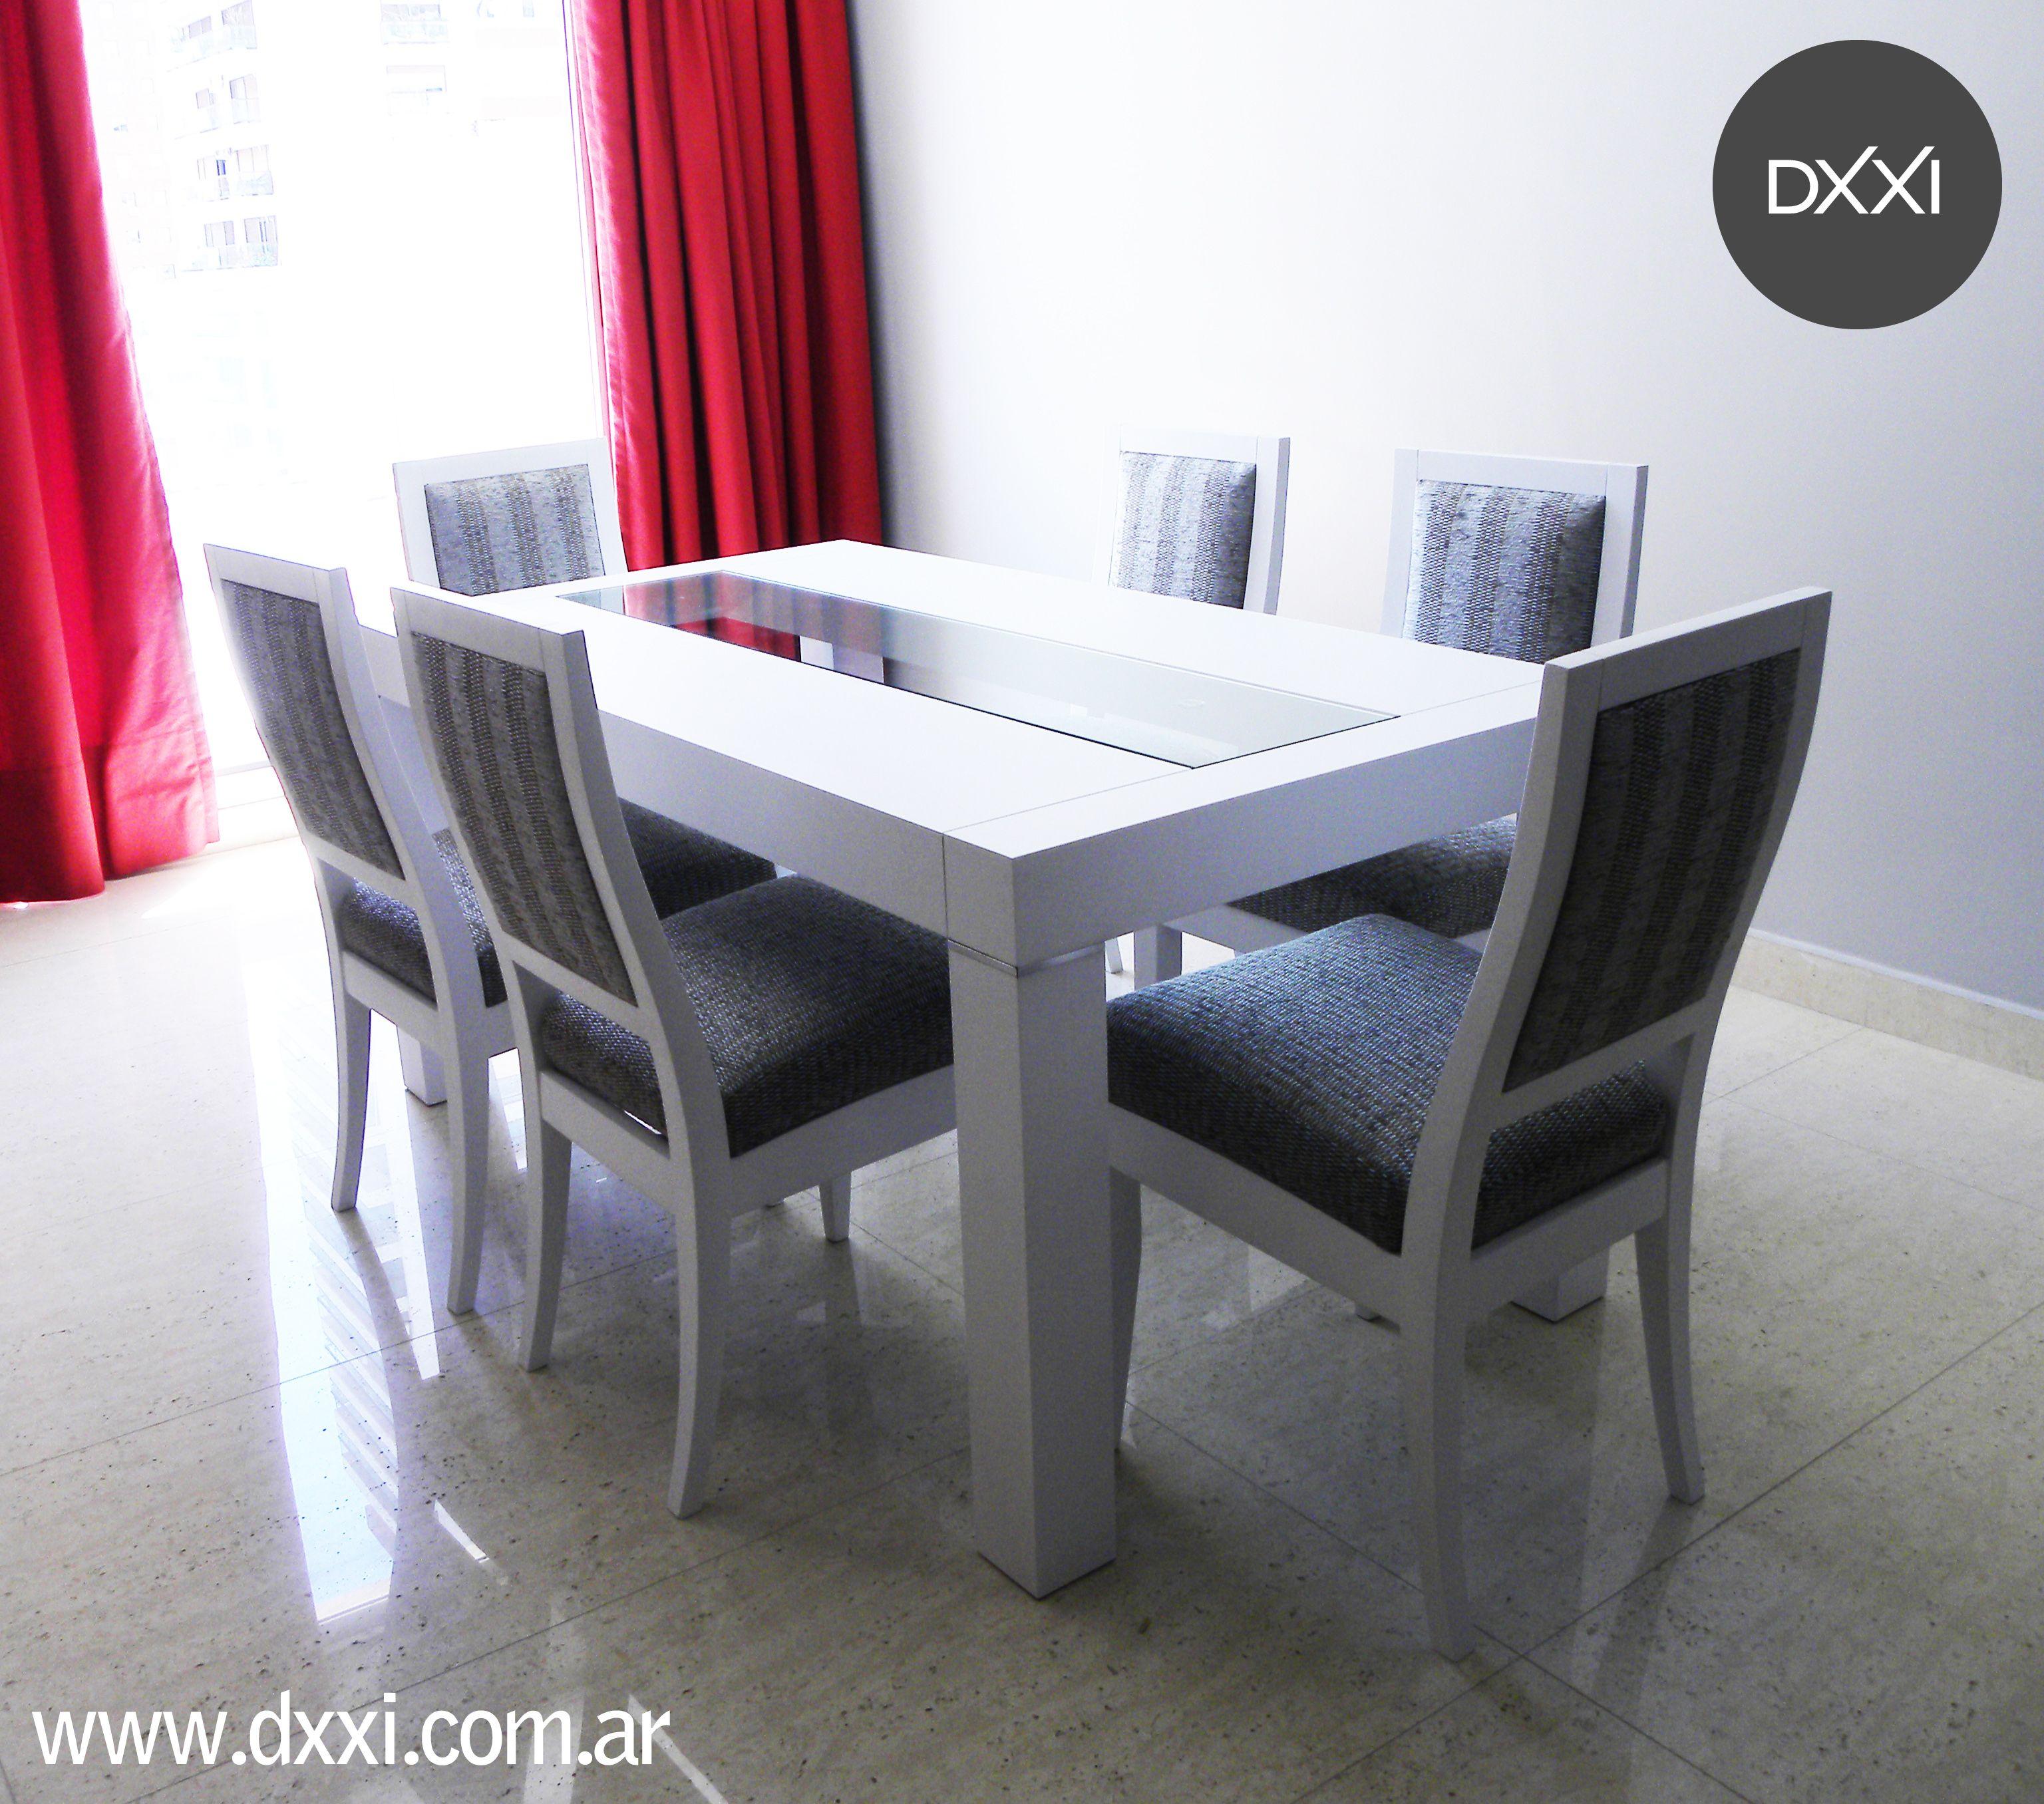 Mesa de comedor modelo mora mdf laqueado blanco semi mate vidrio de 10mm sillas modelo urbana for Comedor de vidrio